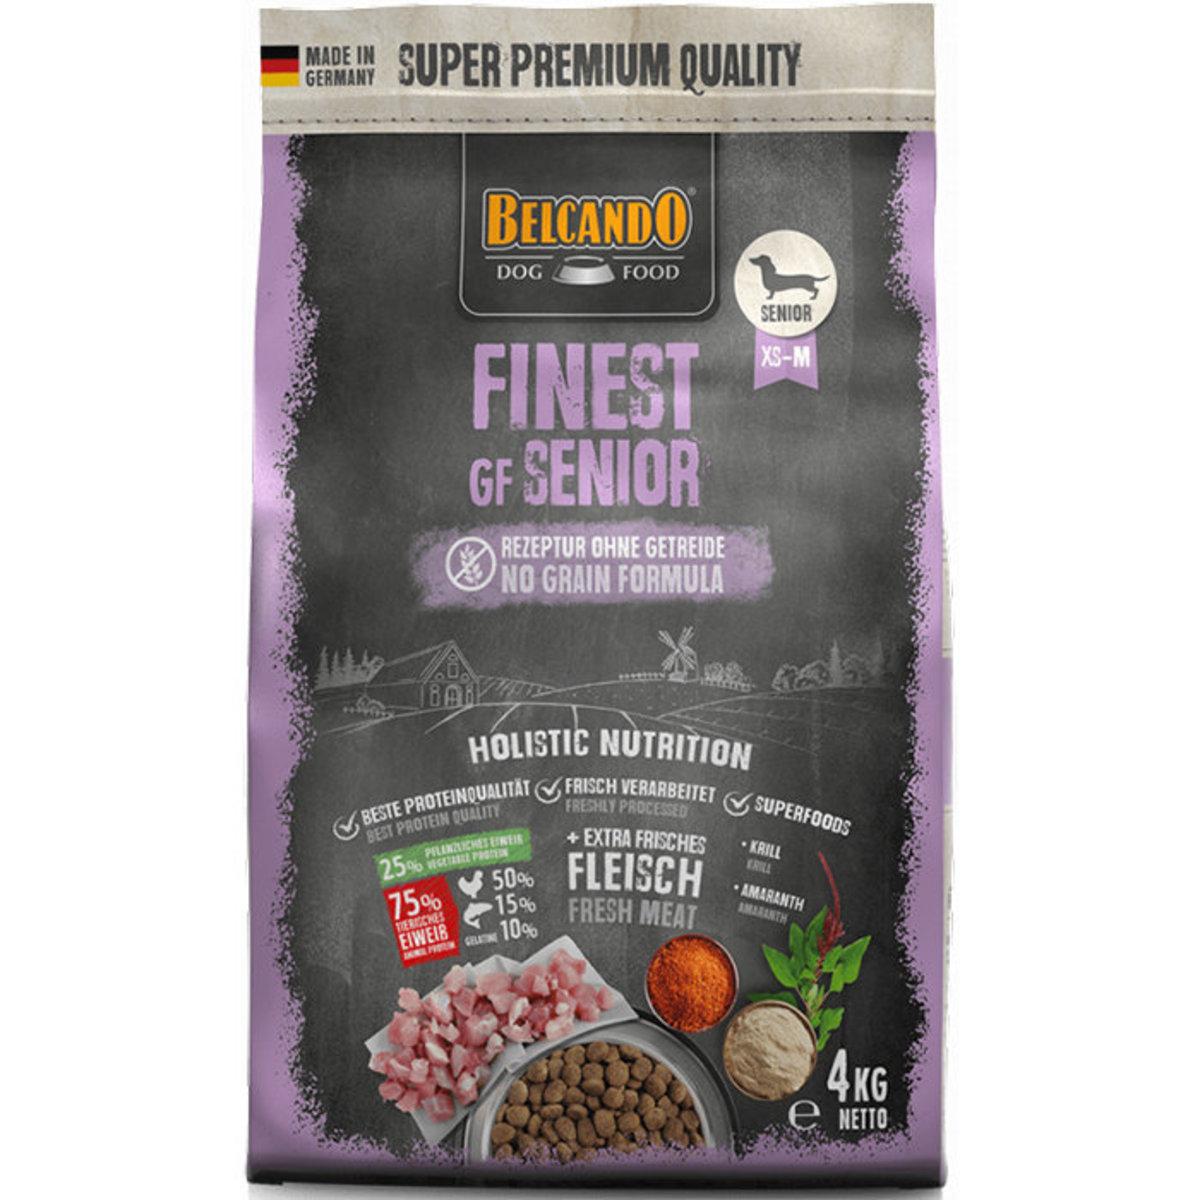 Finest Grain Free Senior Formula Dry Dog Food 4kg